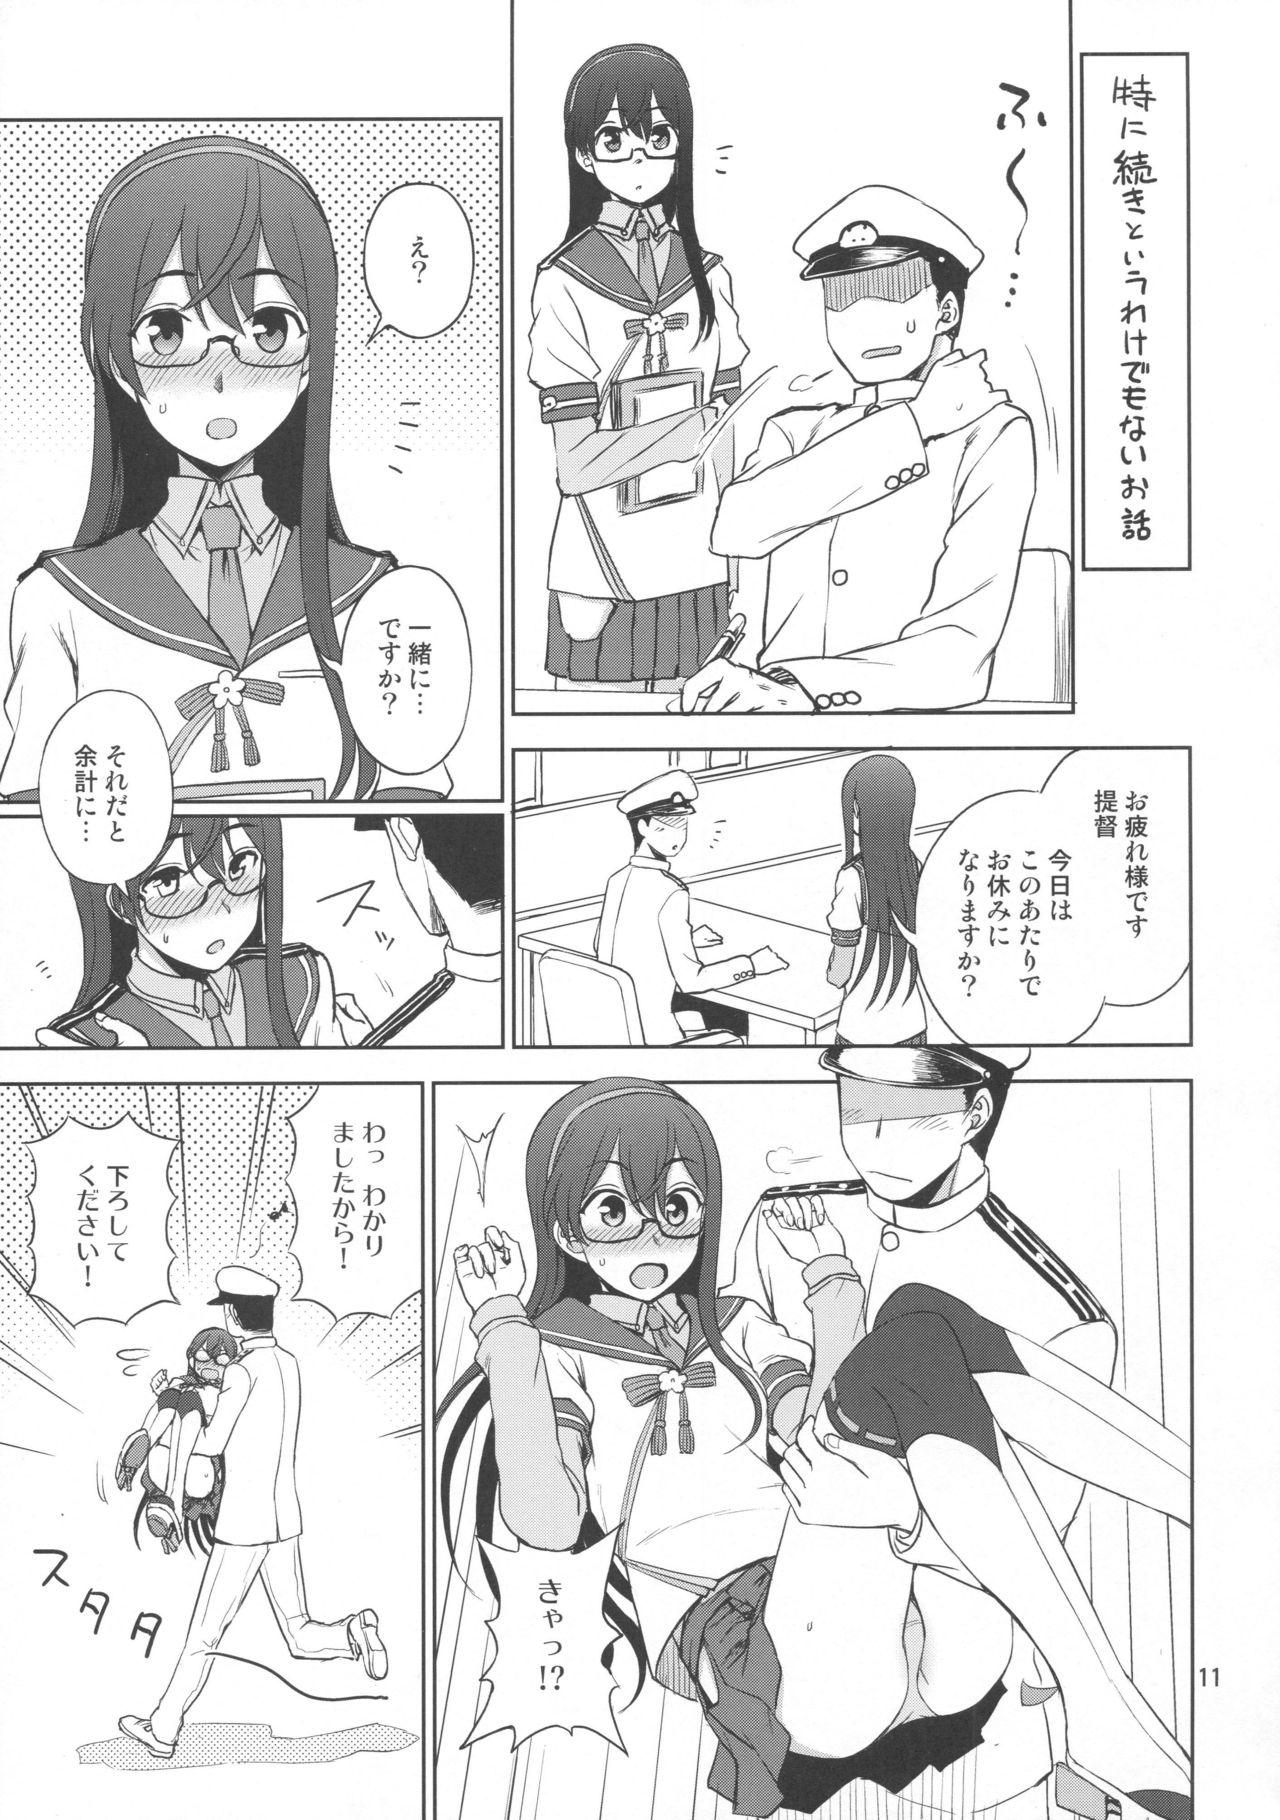 Ooyodo-san onegaishimasu! 9